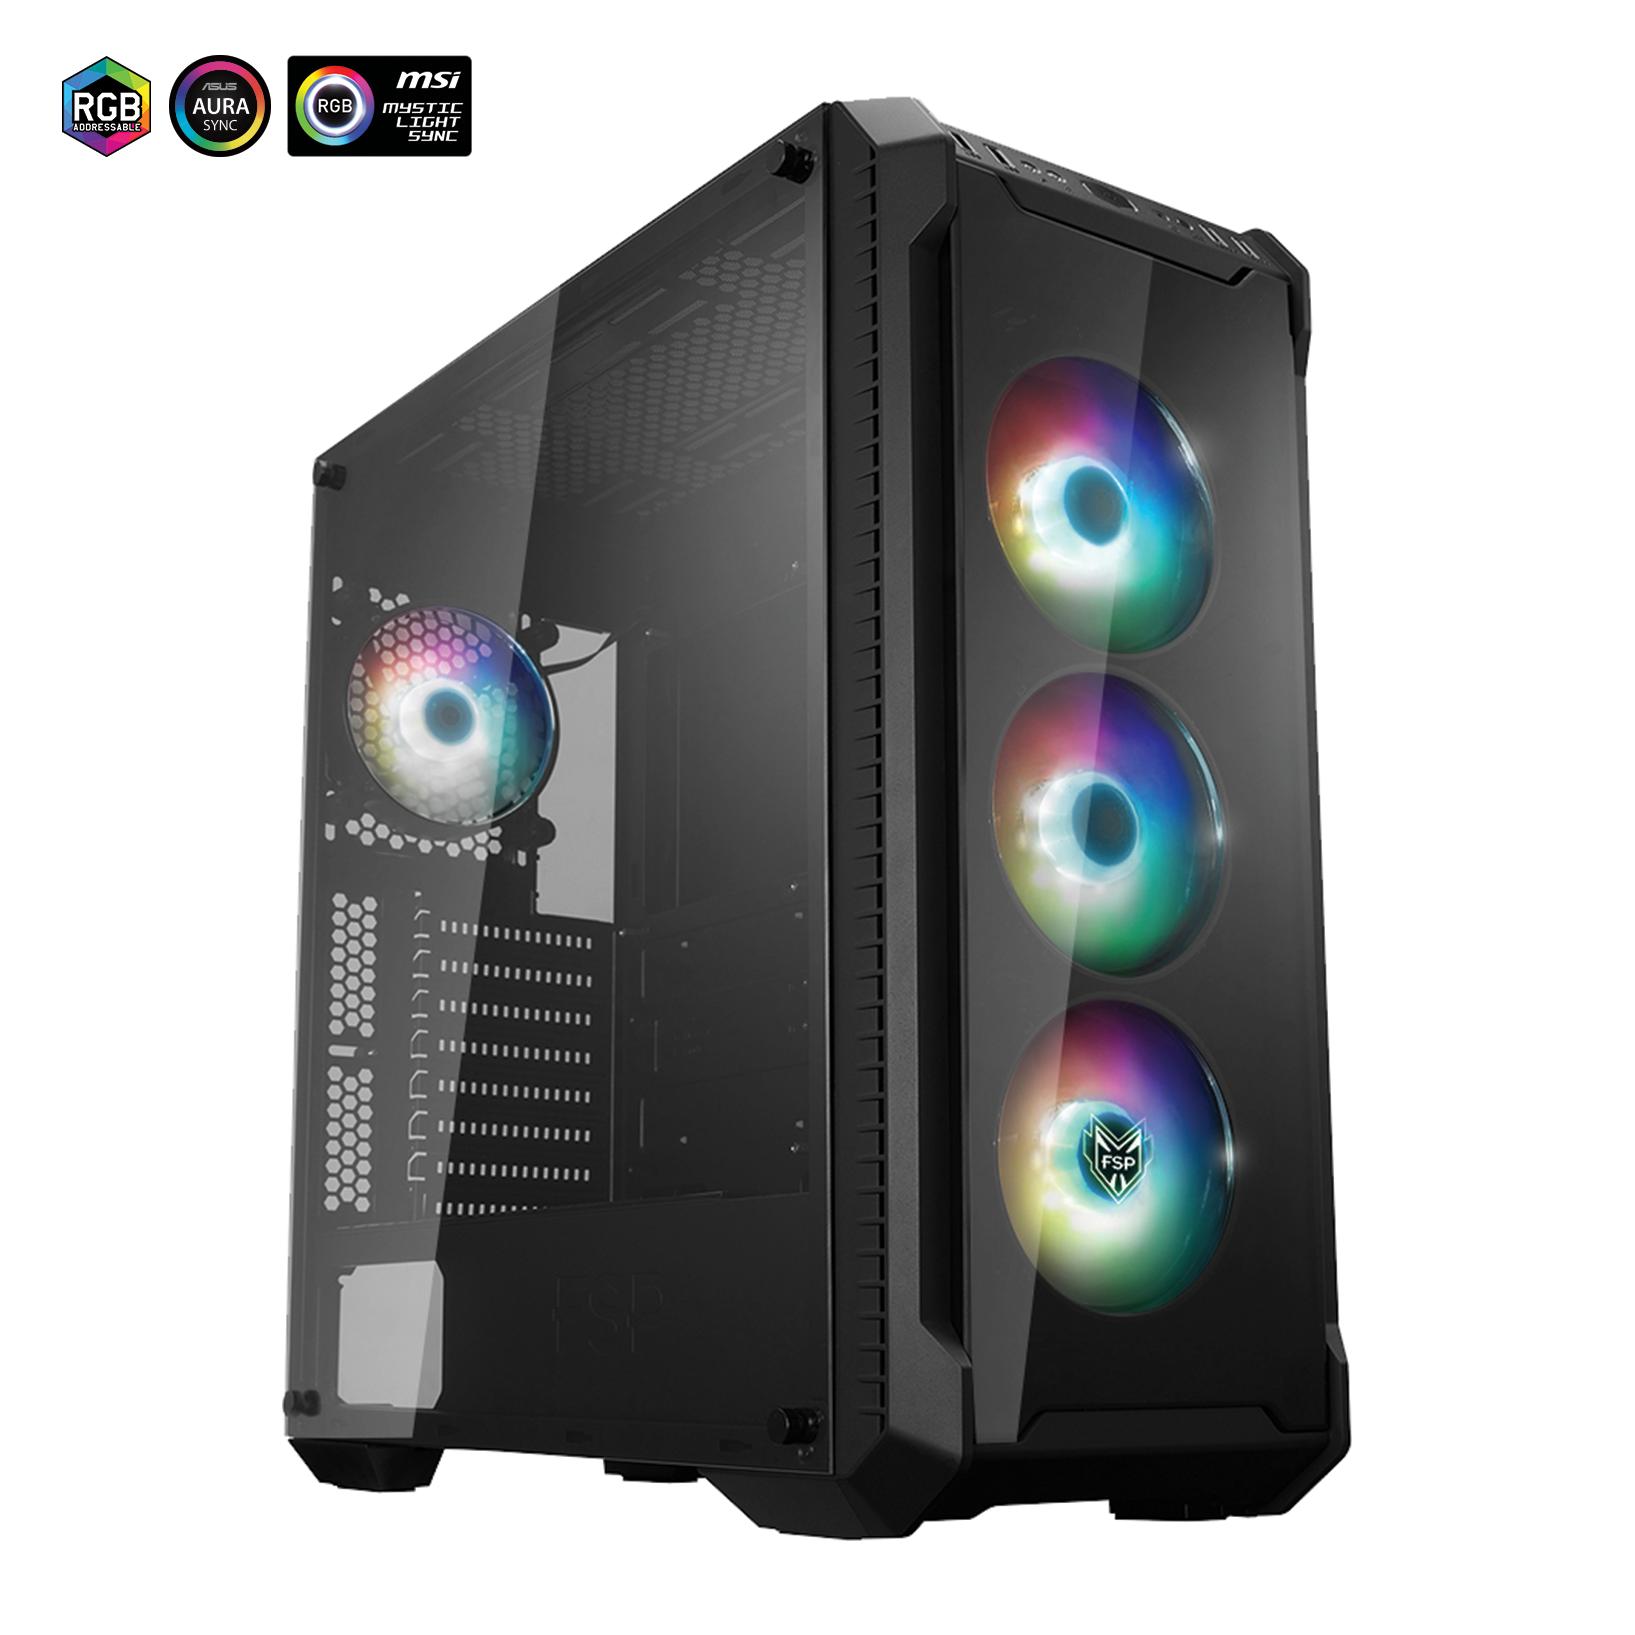 FSP/Fortron ATX Midi Tower CMT520 PLUS black, průhledná bočnice, 4 x A.RGB LED 120 mm ventilátor - POC0000060